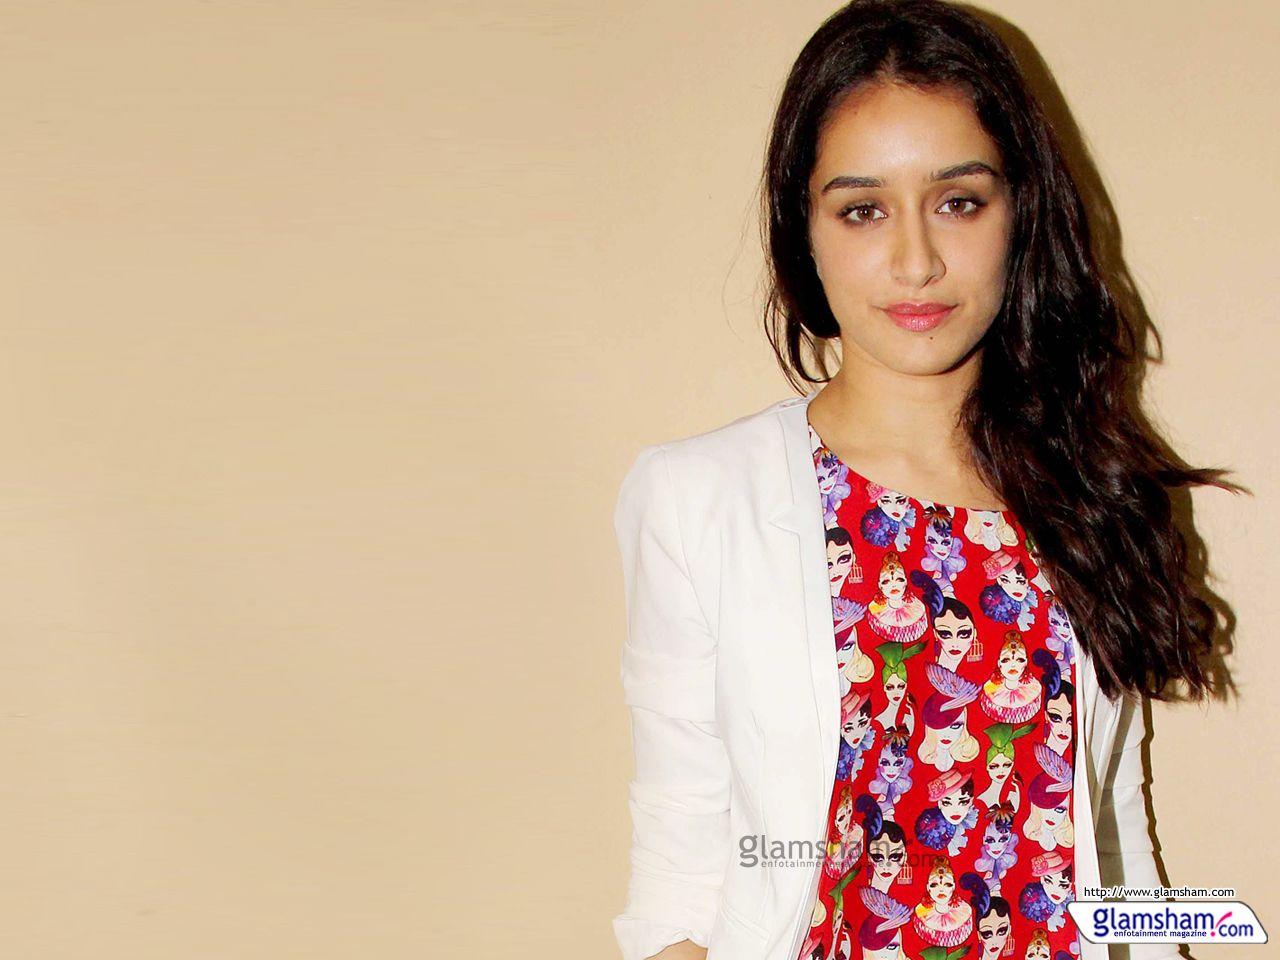 Pin By Jaysawal Raju On Lovely Shardhaa Shraddha Kapoor Actress